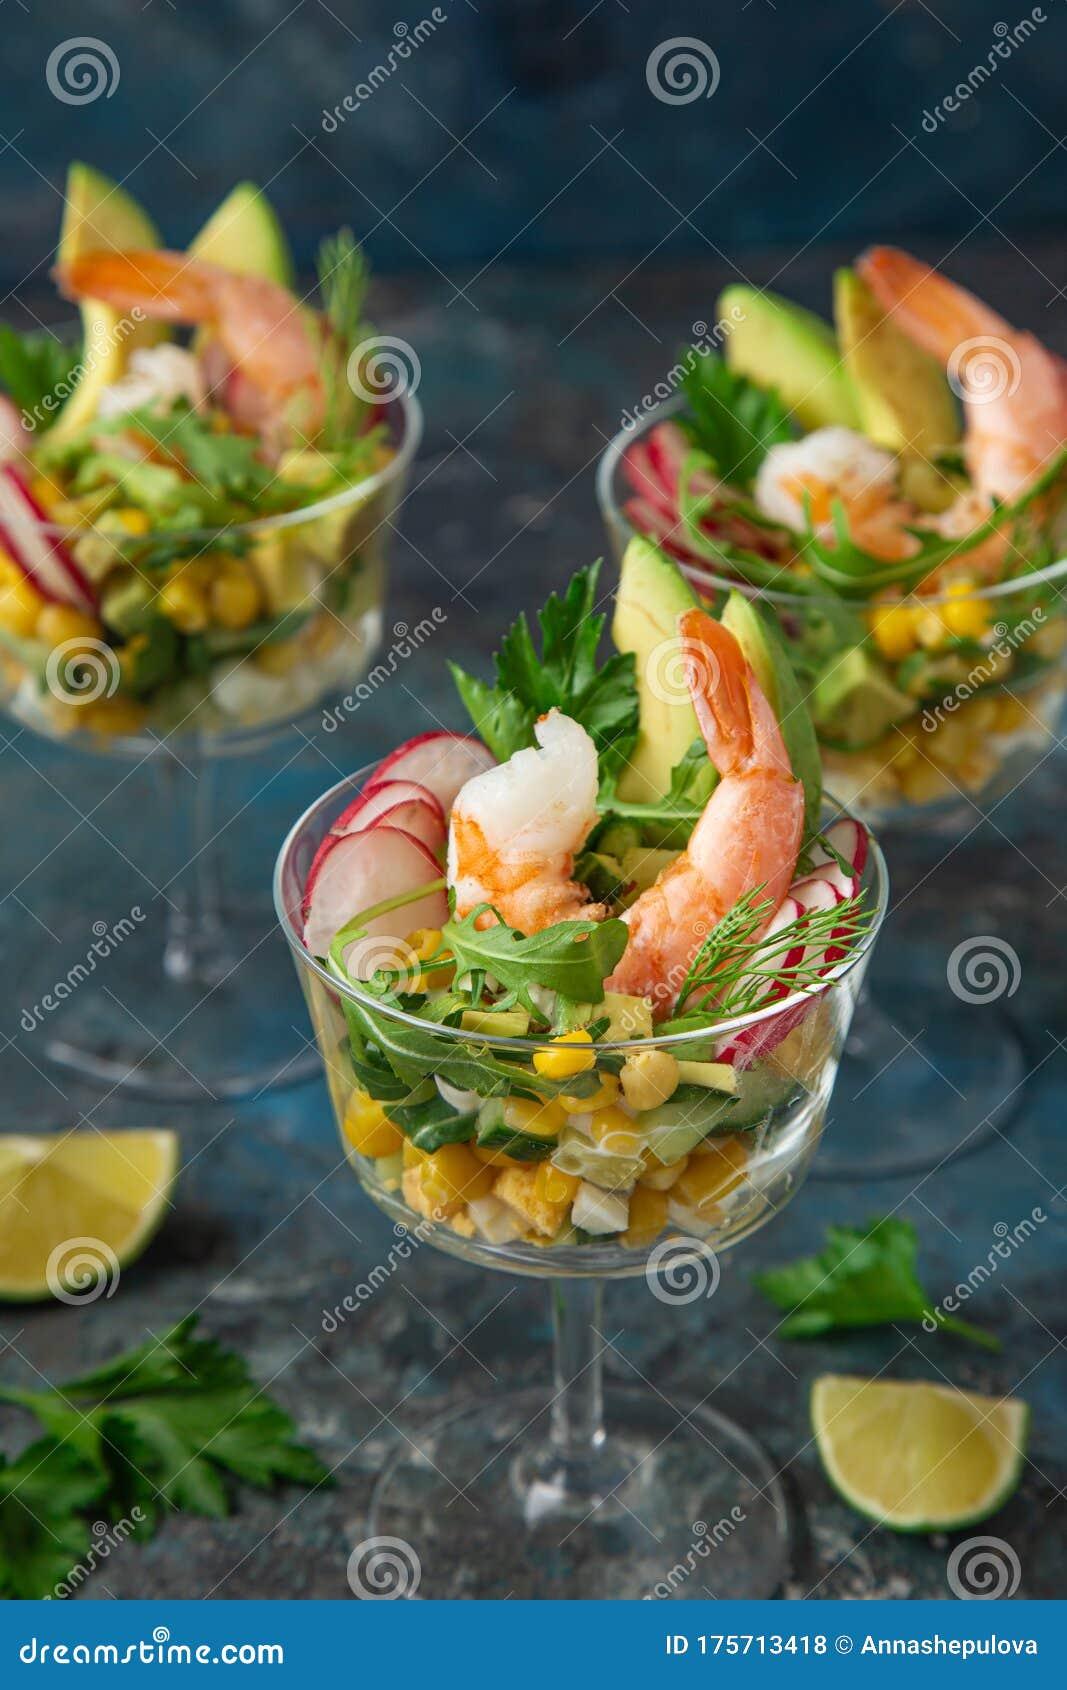 Salad Avocado Cocktail Recipe